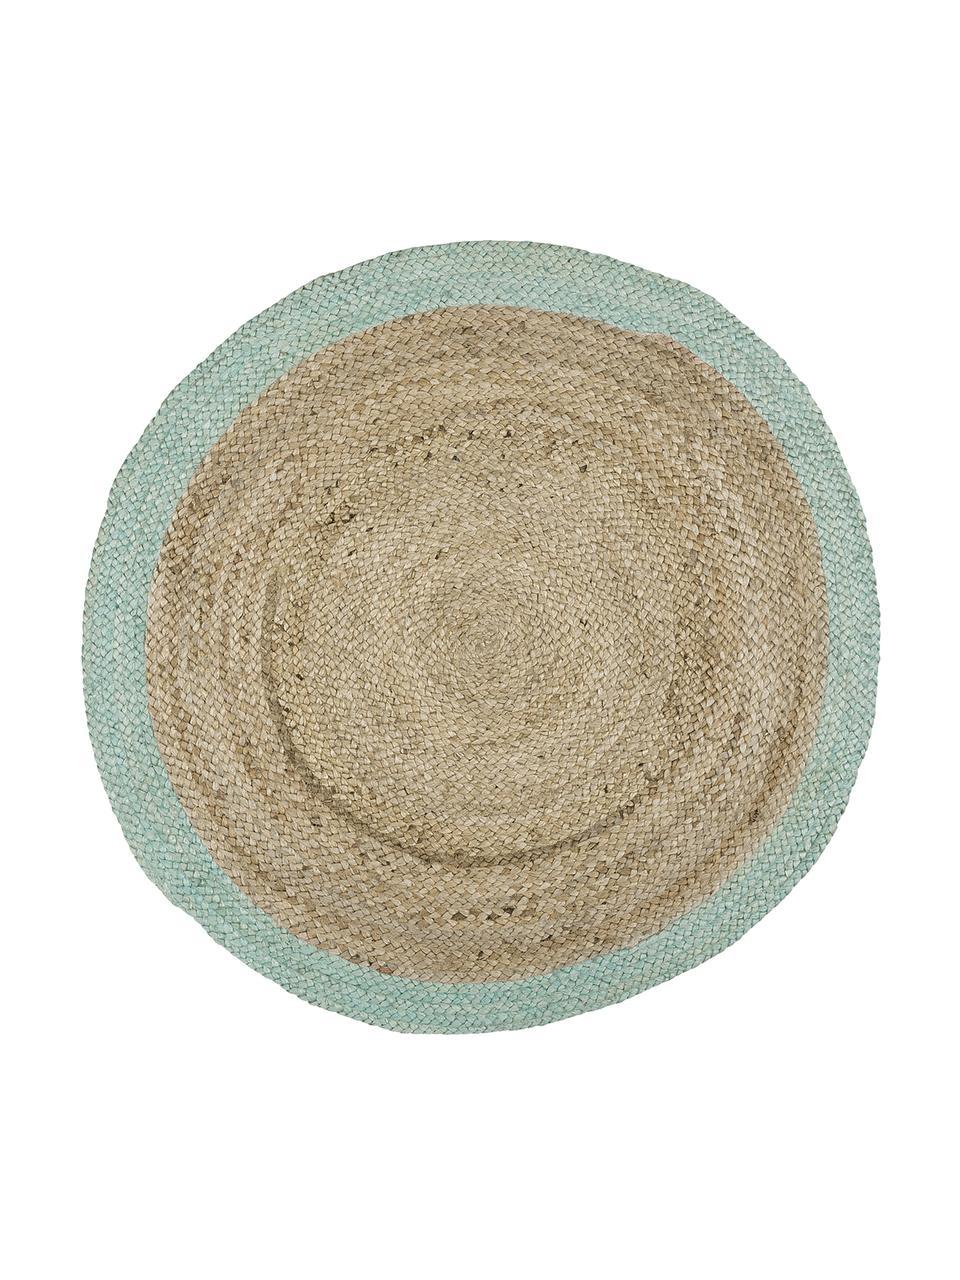 Runder Jute-Teppich Shanta mit mintgrünem Rand, handgefertigt, 100% Jute, Jute, Mintgrün, Ø 100 cm (Größe XS)